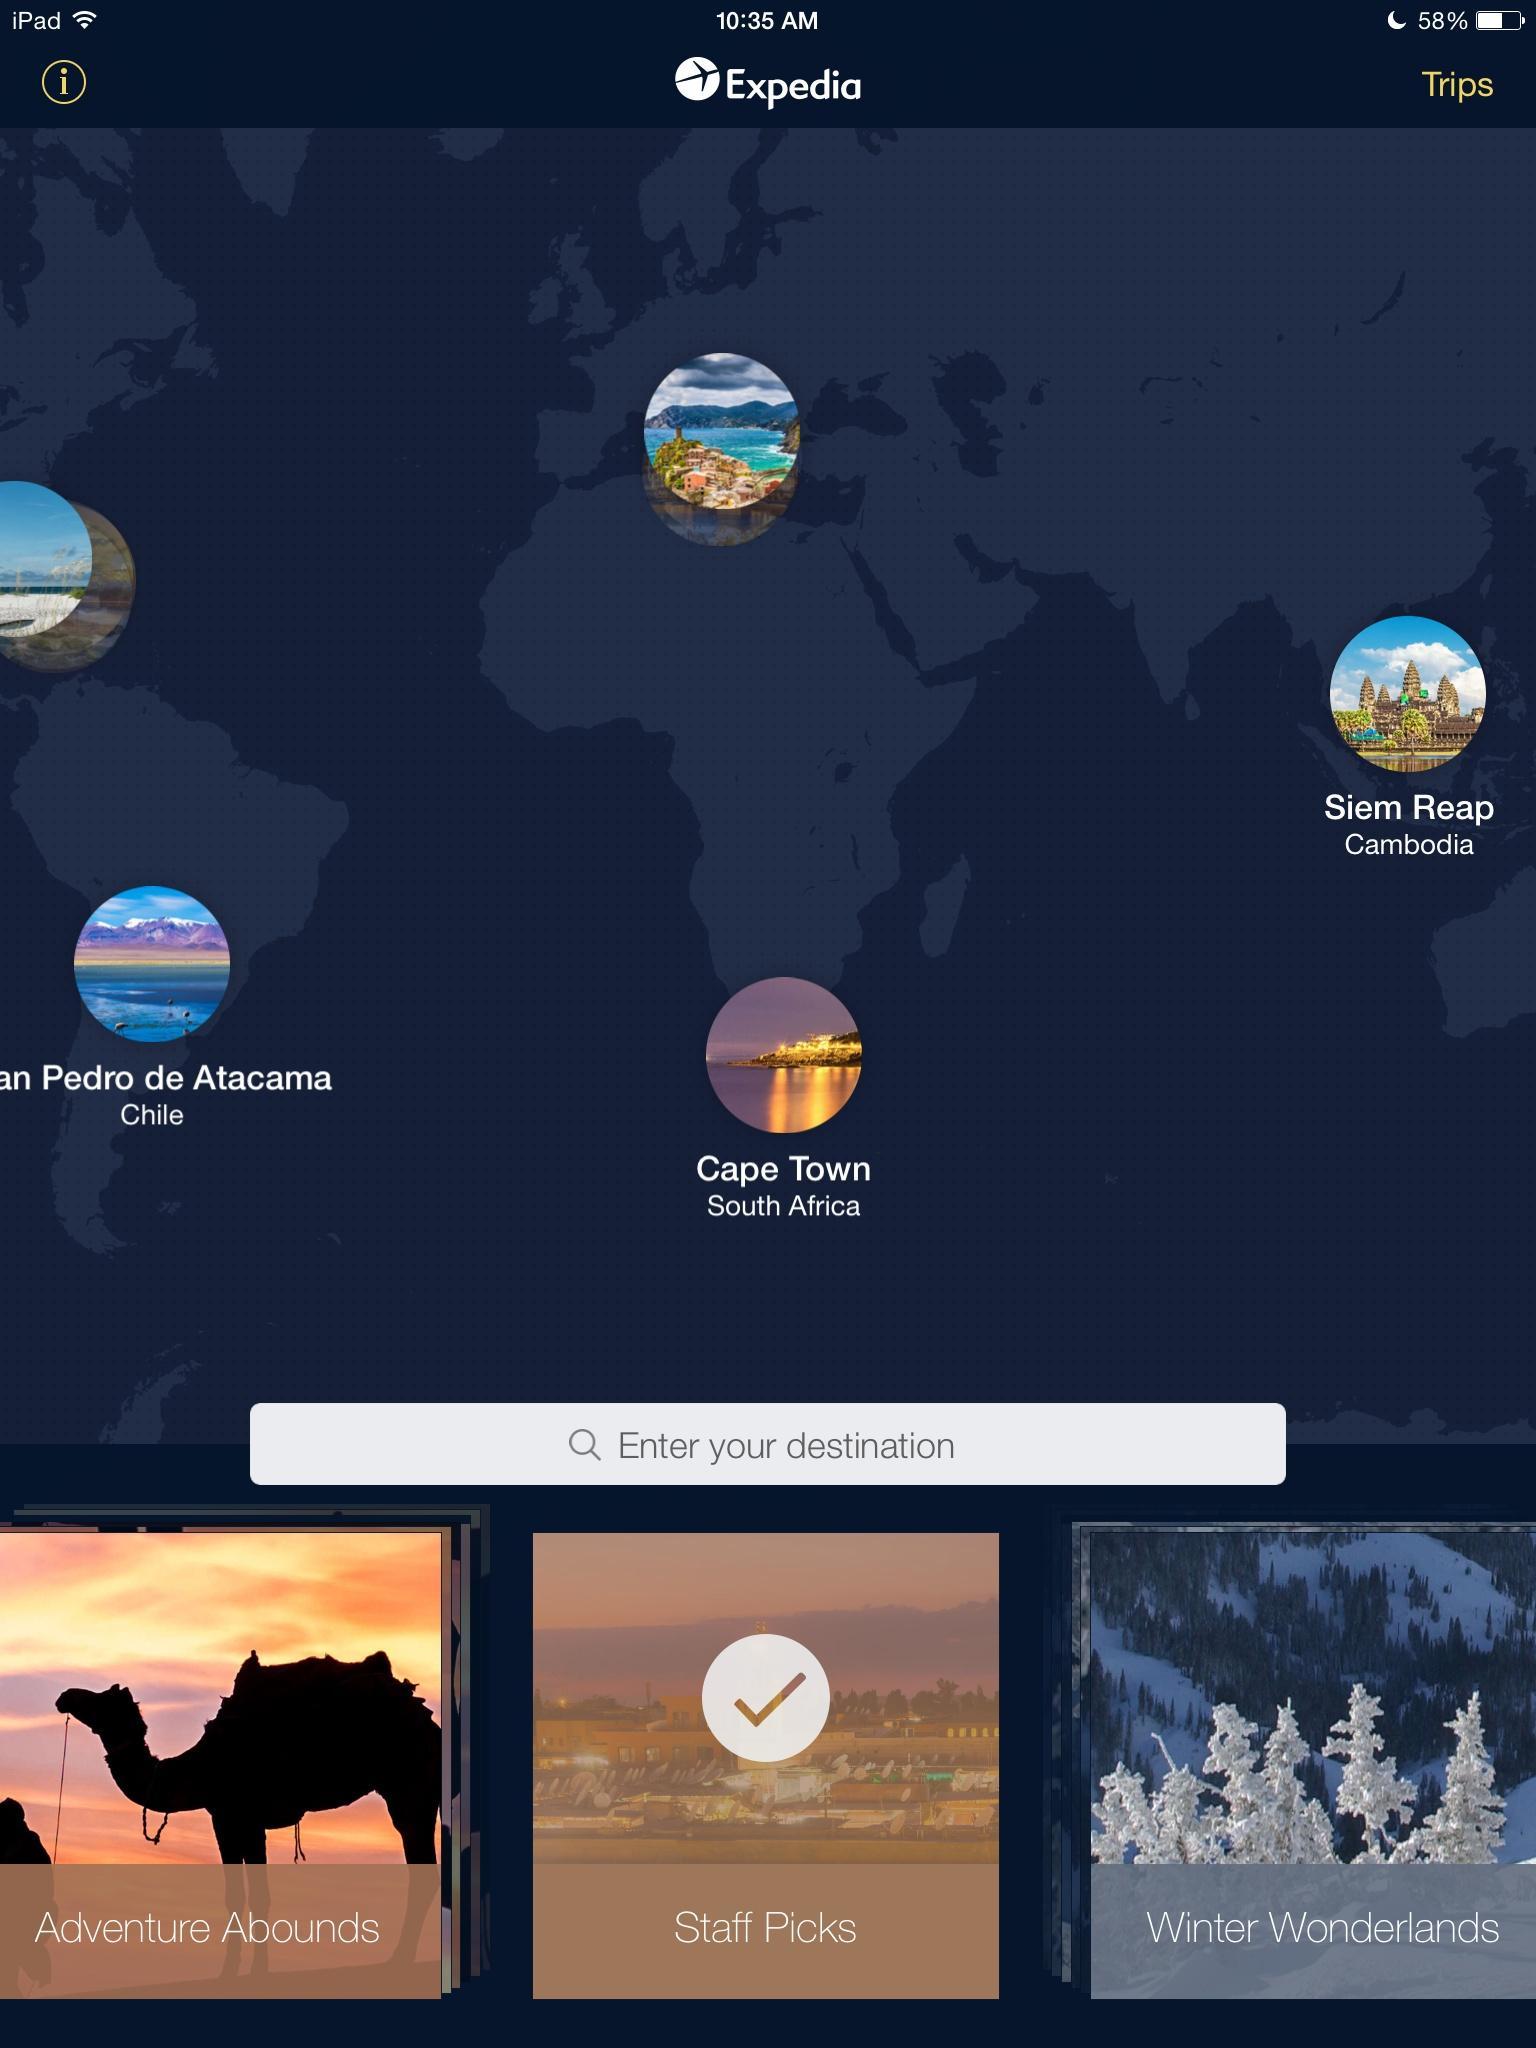 Expedia Hotels, Flights & Cars  探索